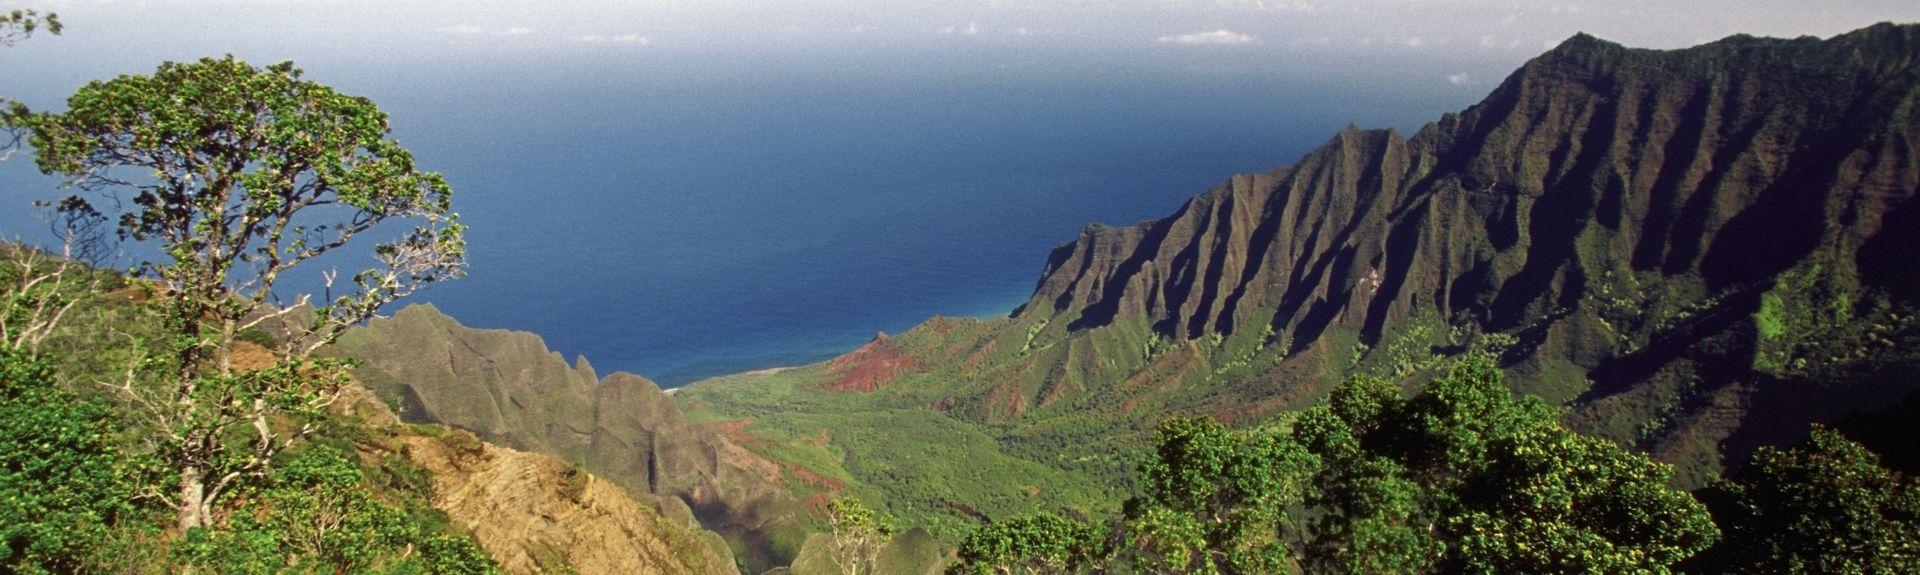 Waimea, Hawaii, United States of America